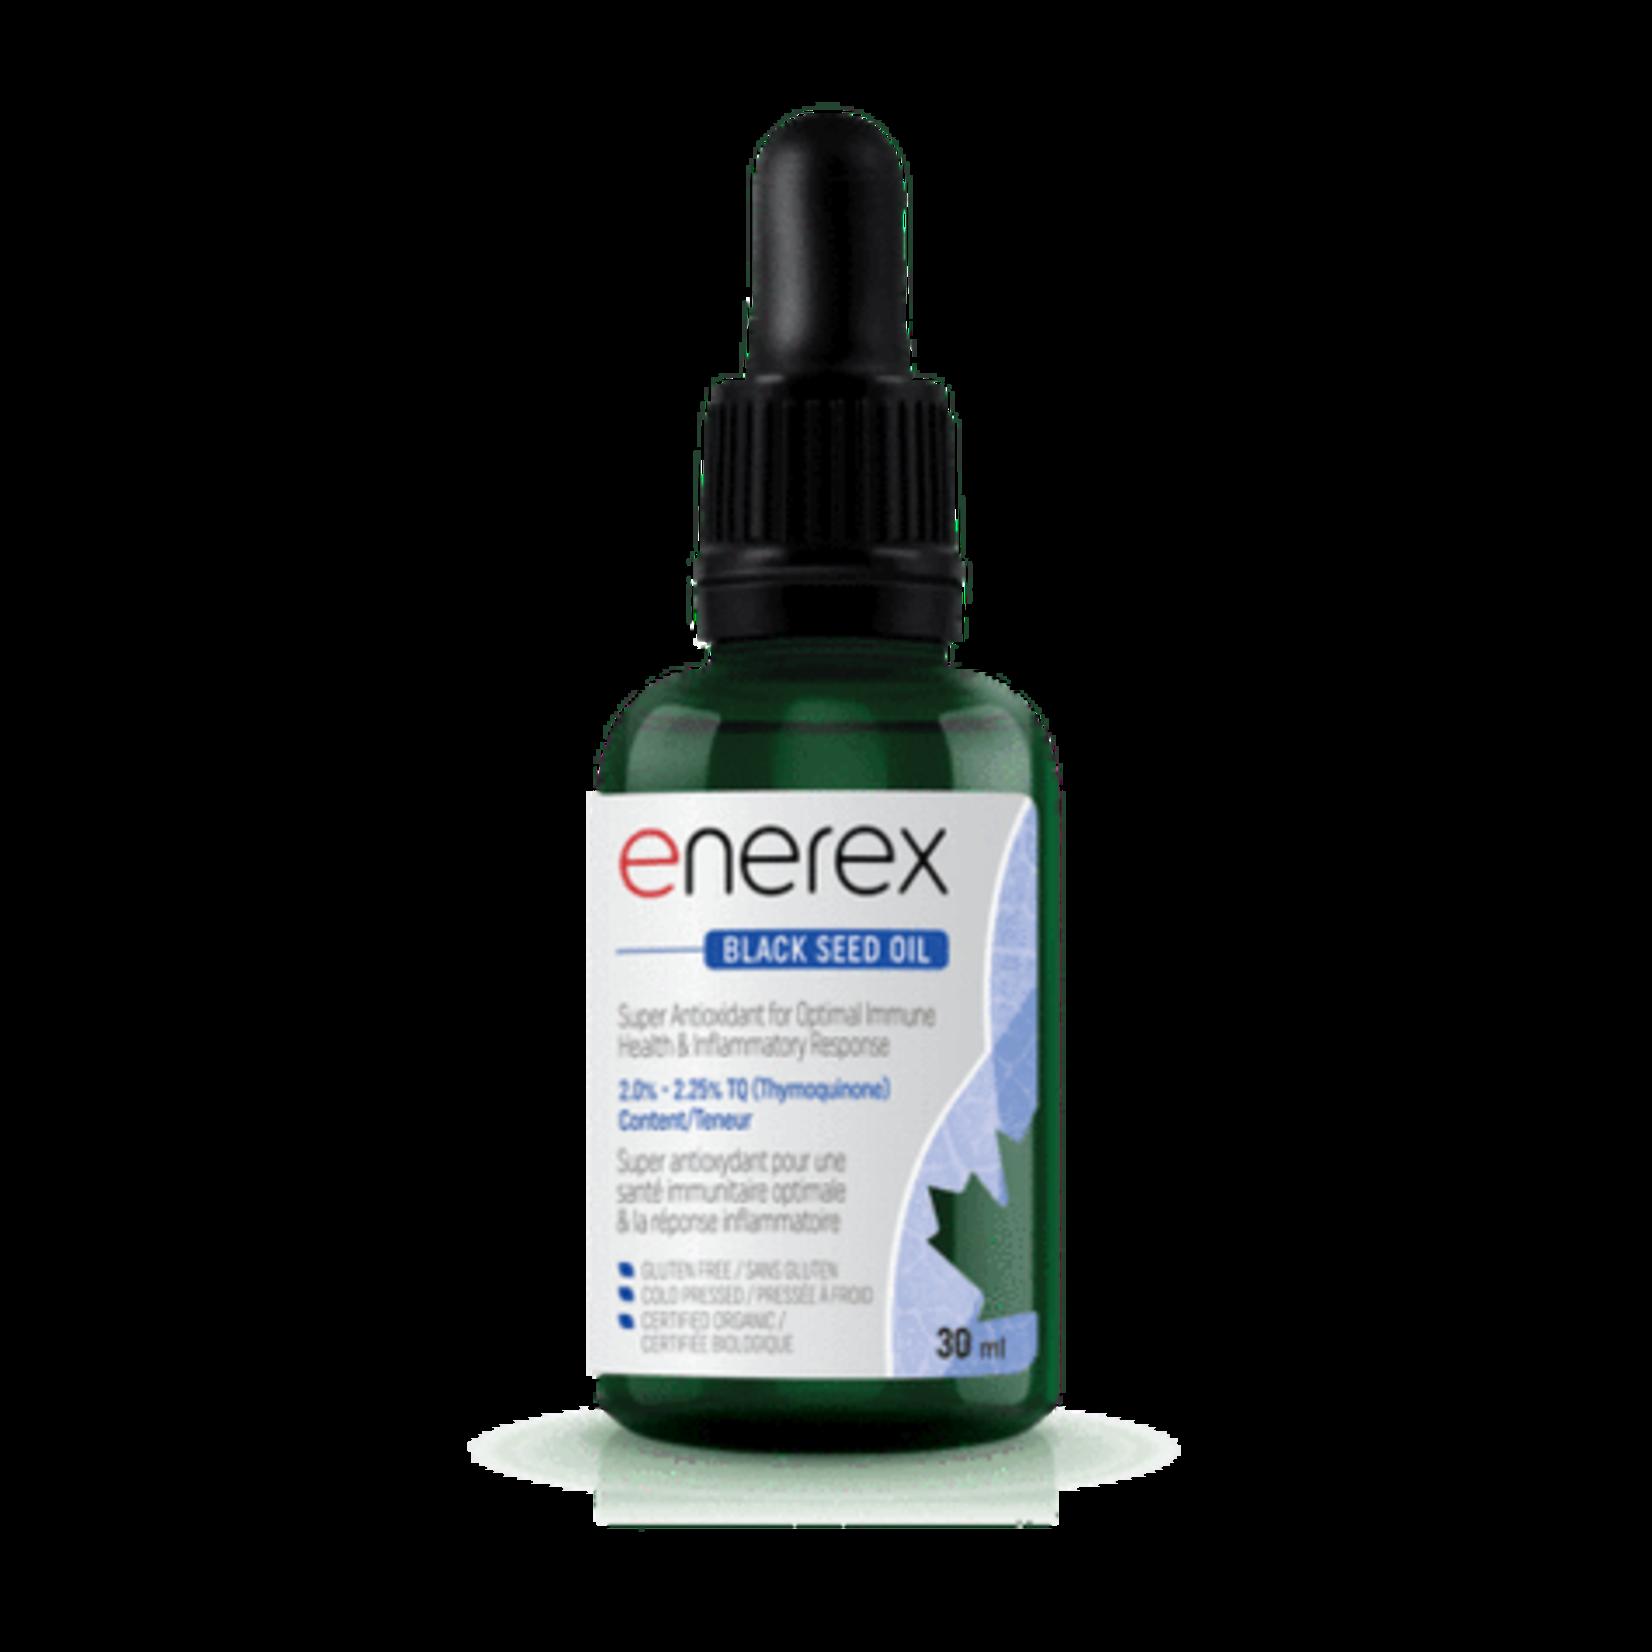 Enerex Enerex Black Seed Oil 30ml